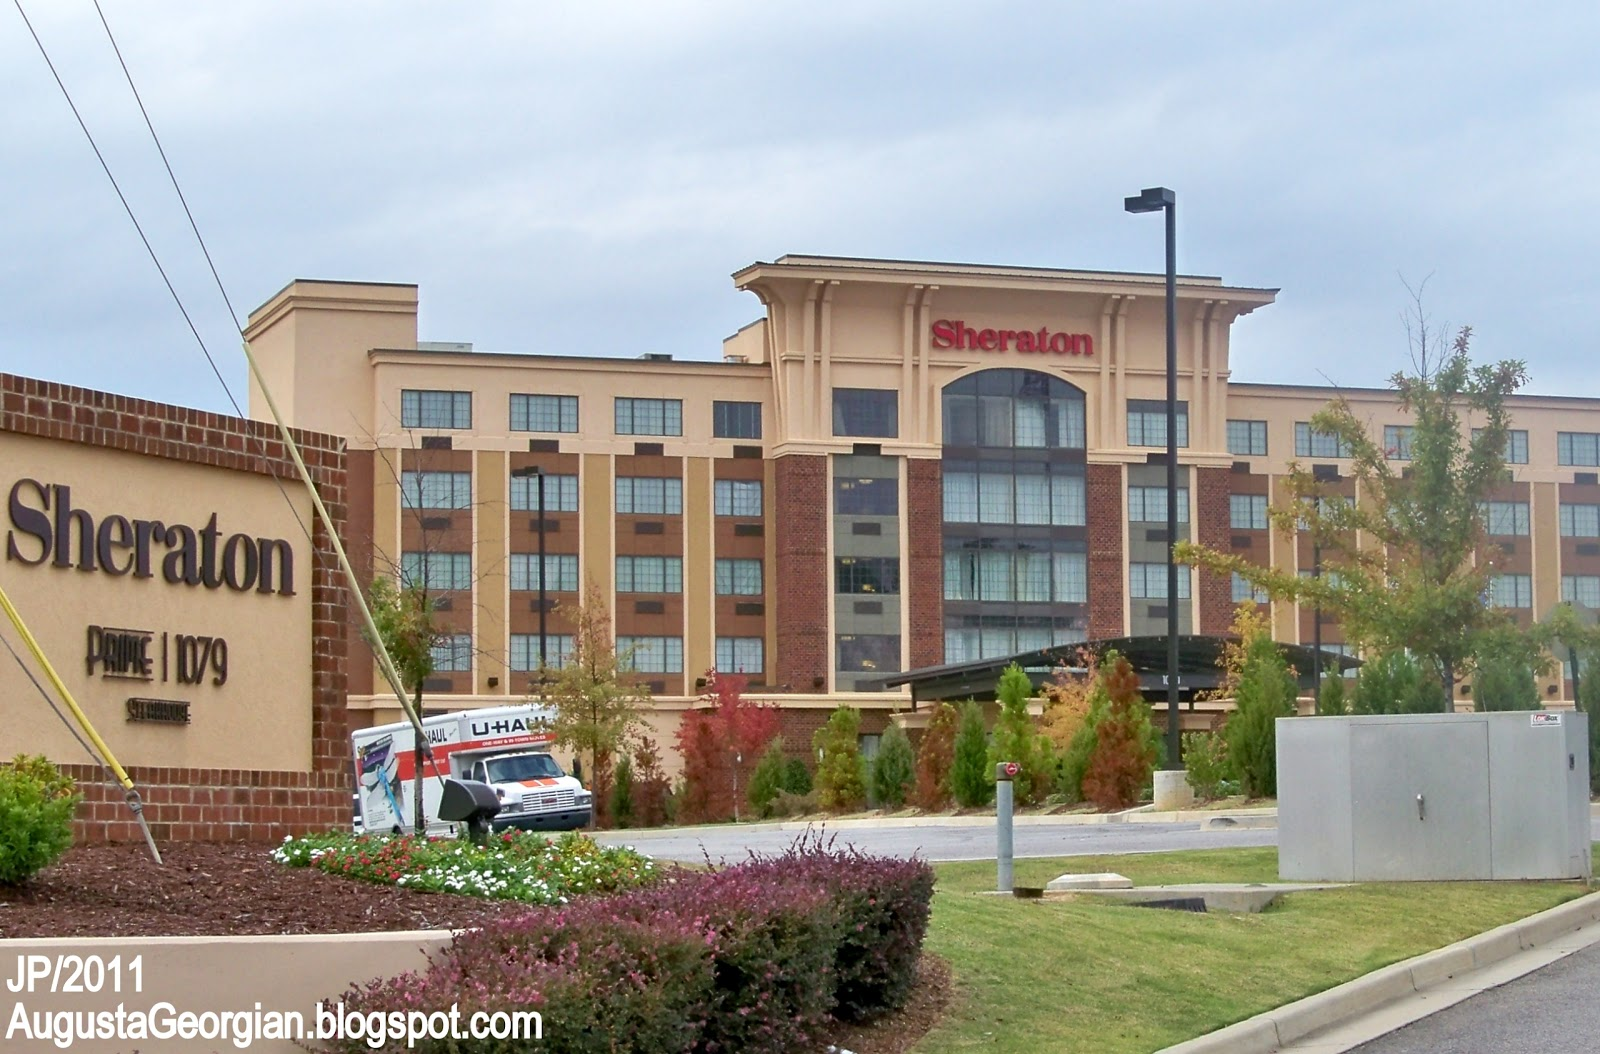 Car Dealerships In Augusta Ga >> AUGUSTA GEORGIA Richmond Columbia Restaurant Bank Attorney Hospital Store Masters Golf ...